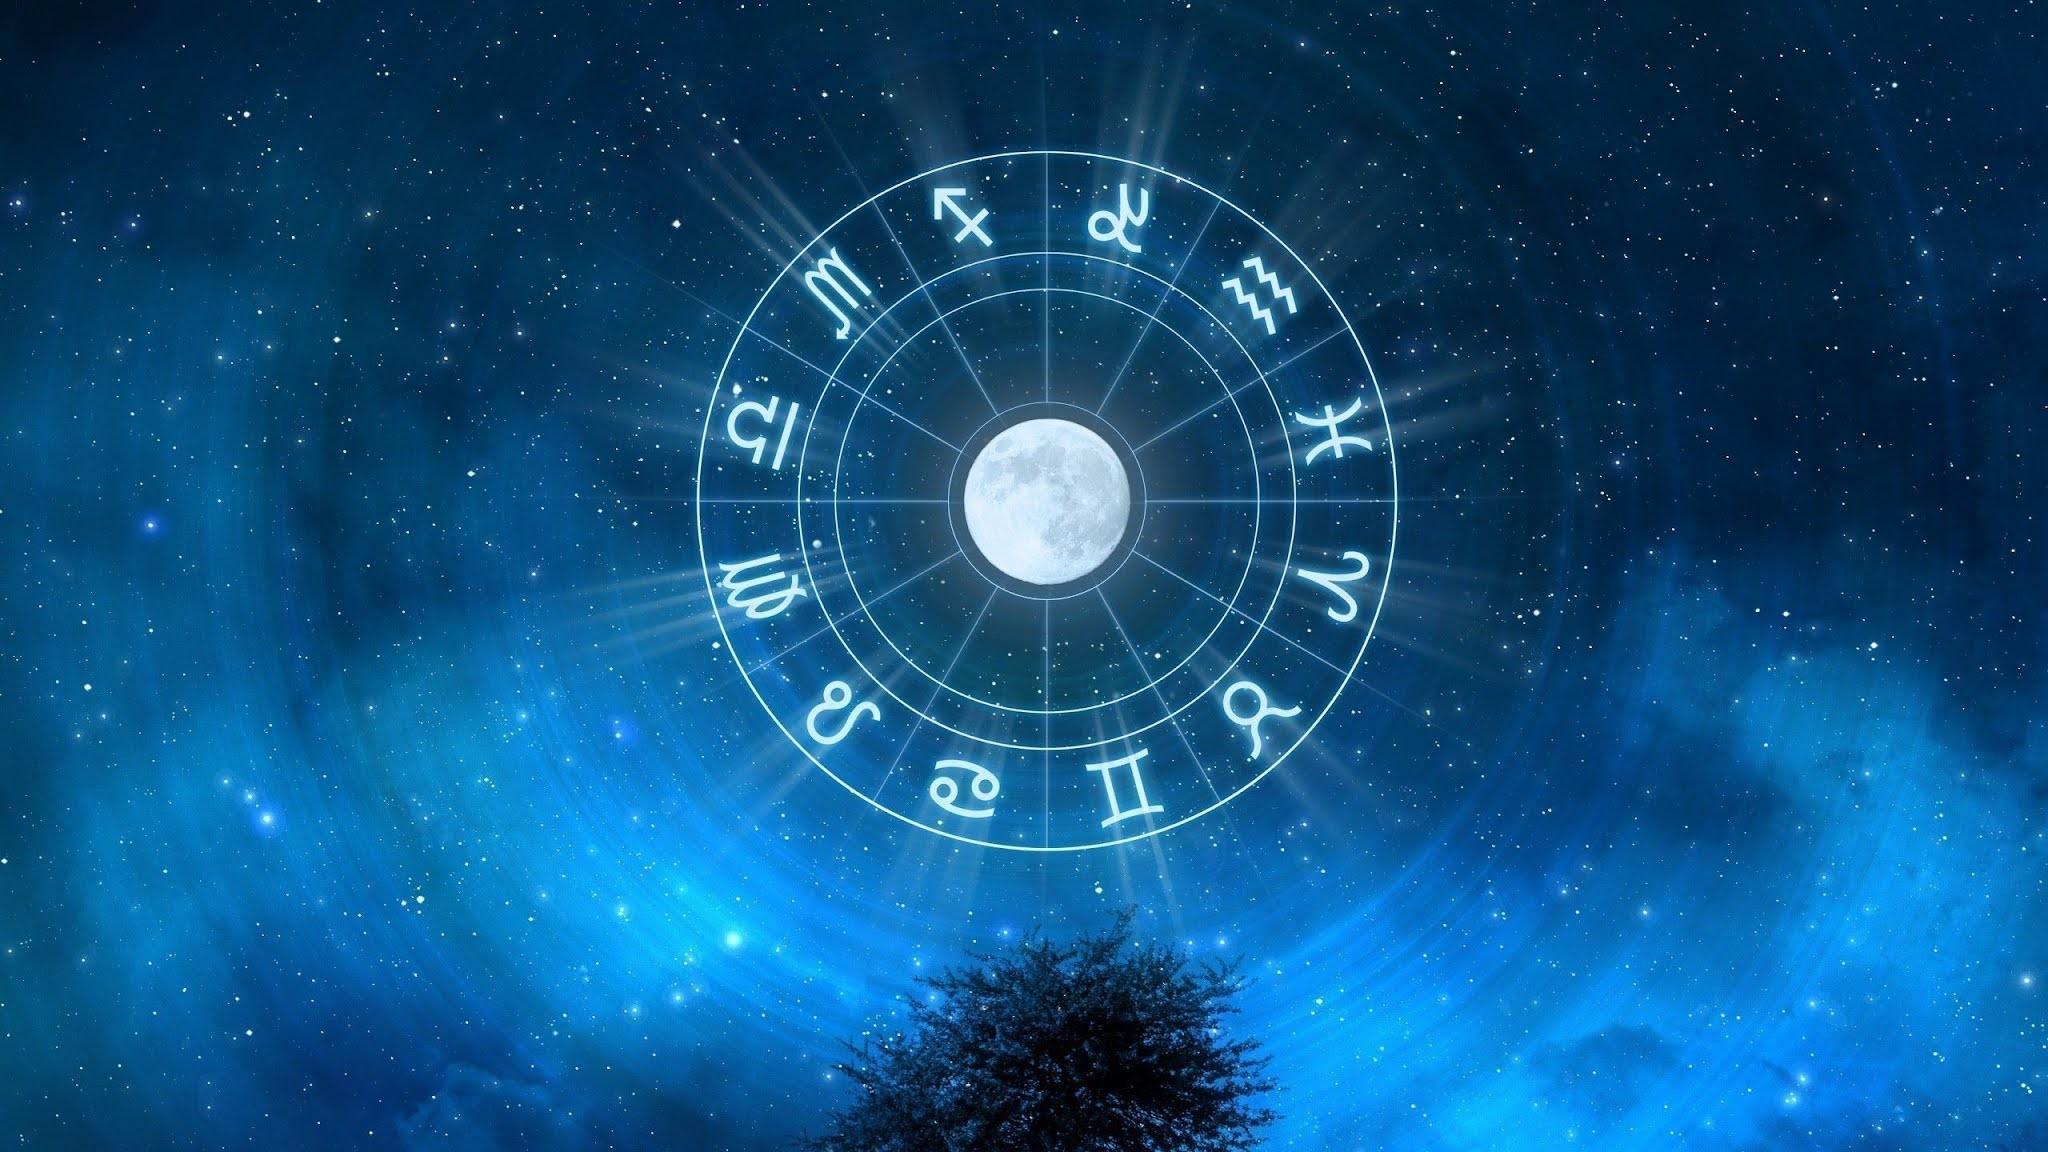 Astrologi! Aries, Libra, dan Sagitarius Adalah Zodiak yang Paling Suka Bersenang-senang